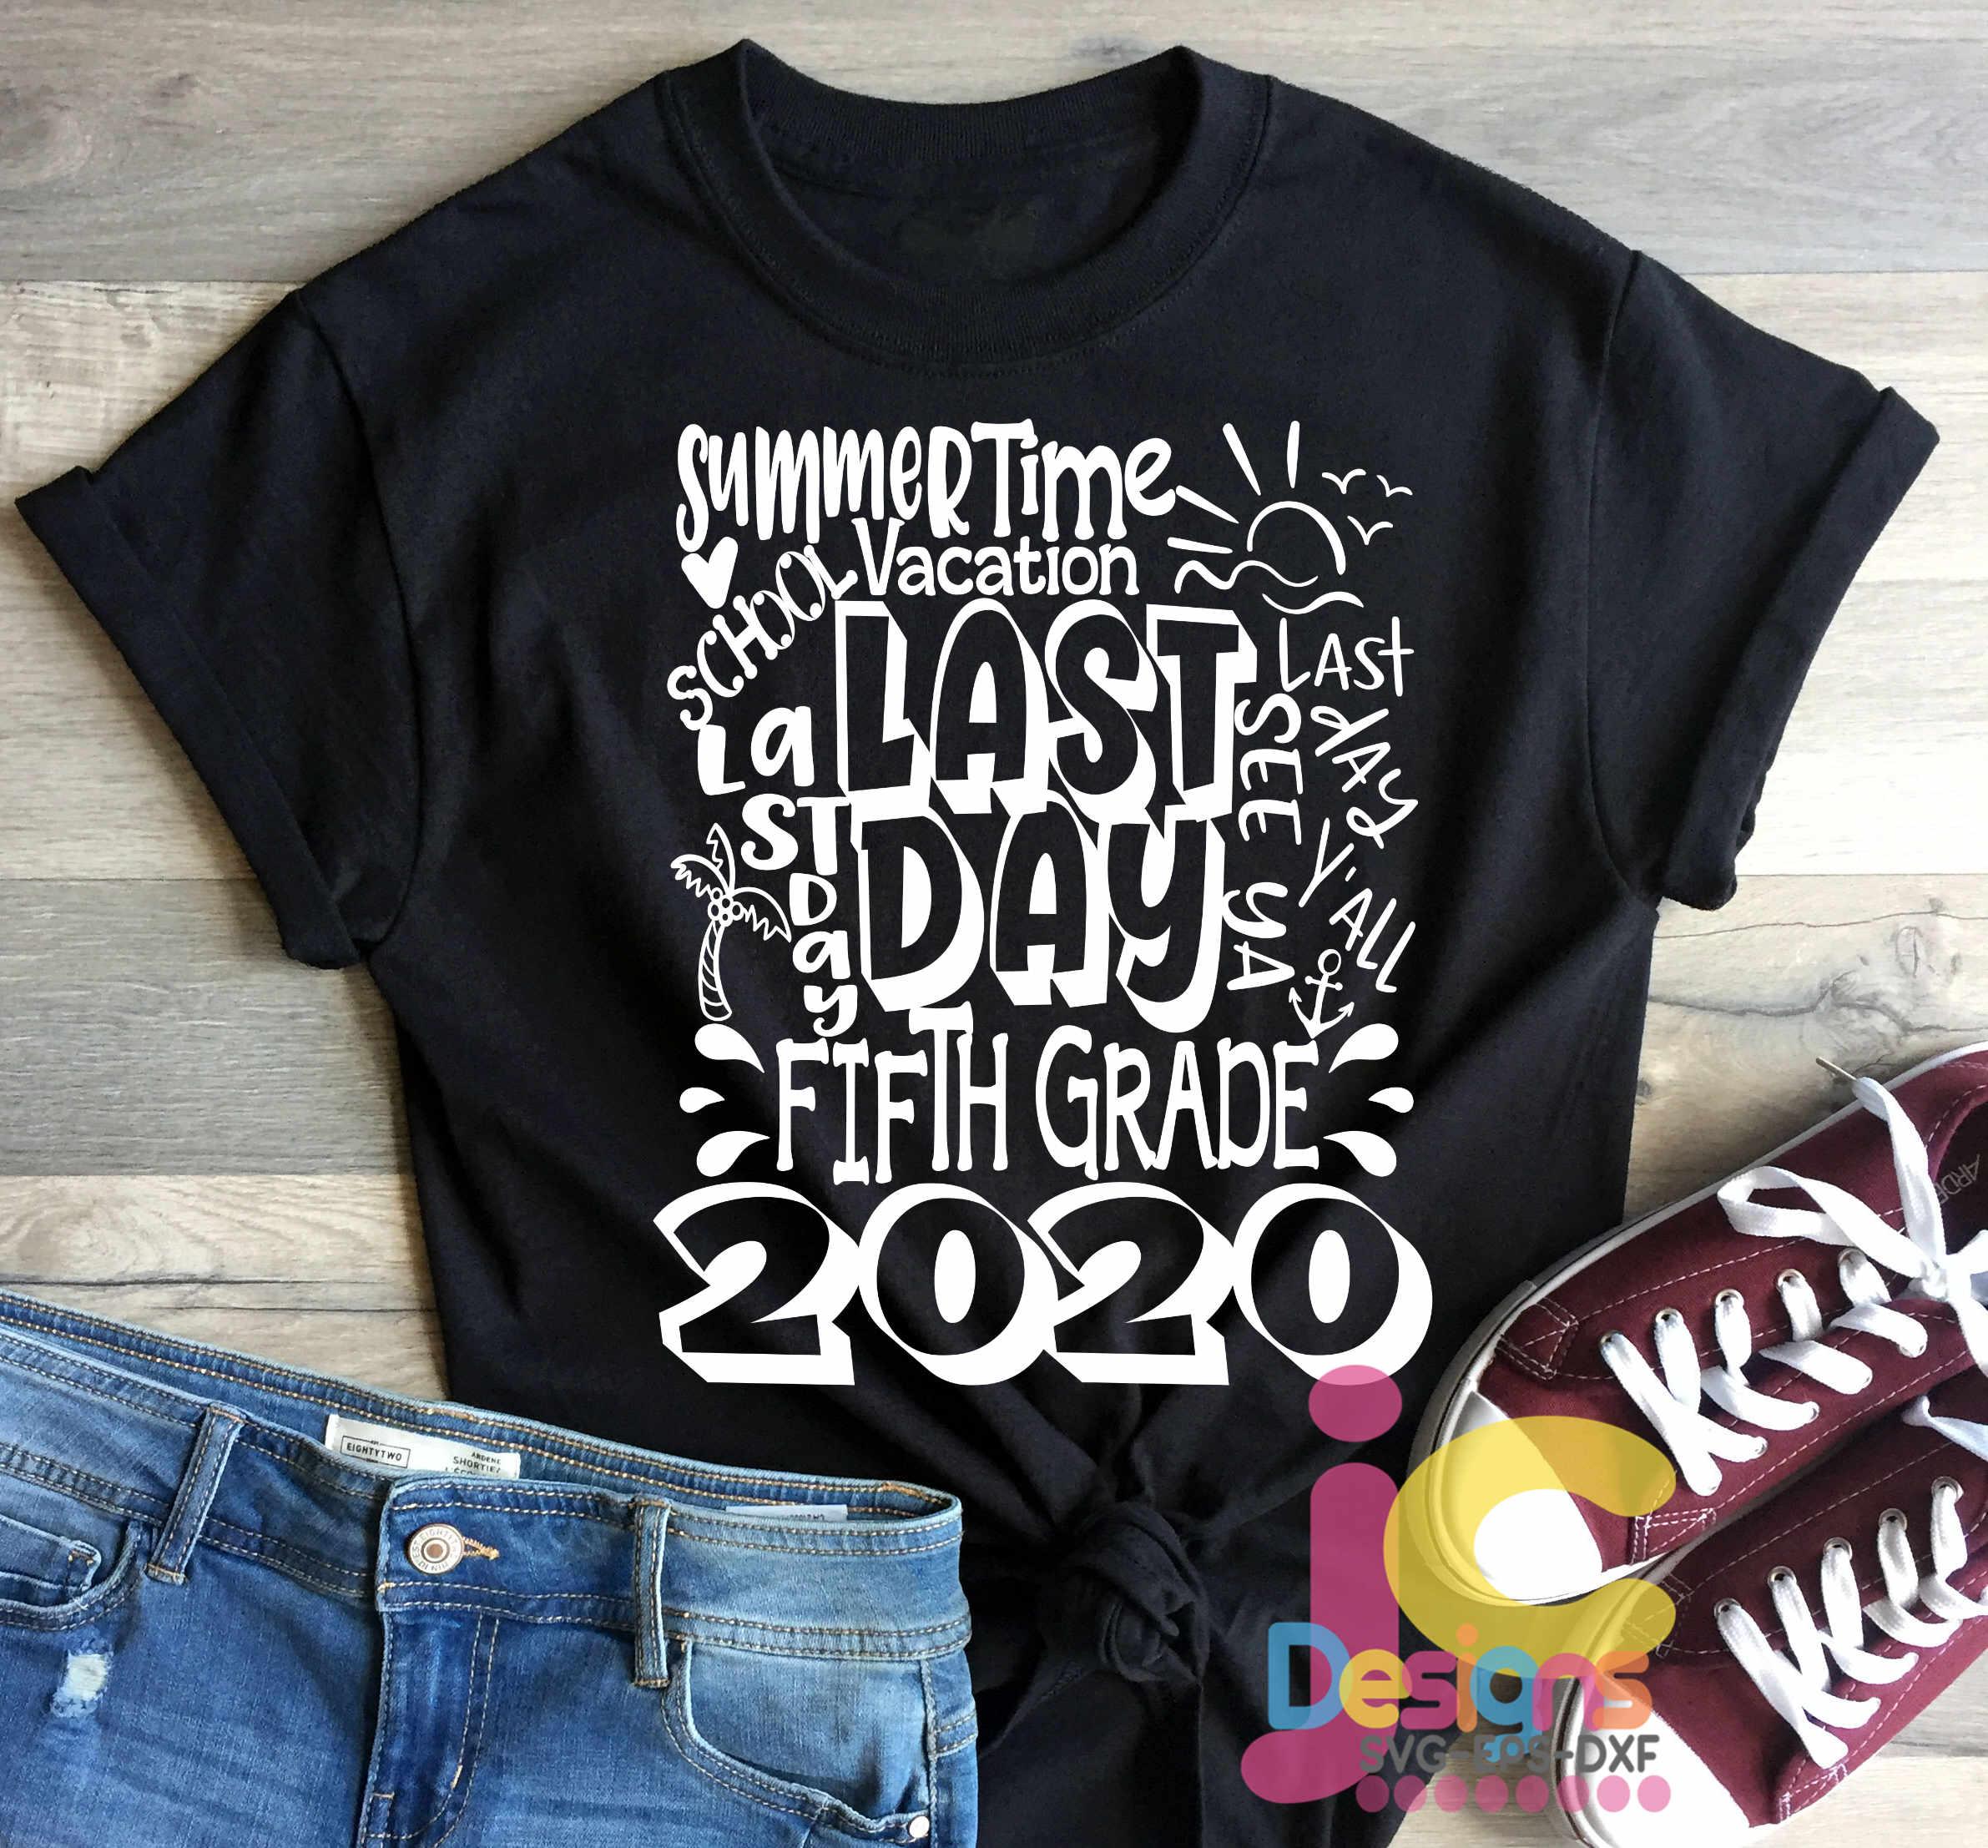 2020 Fifth 5th Grade Last day of school svg Design Cricut example image 2